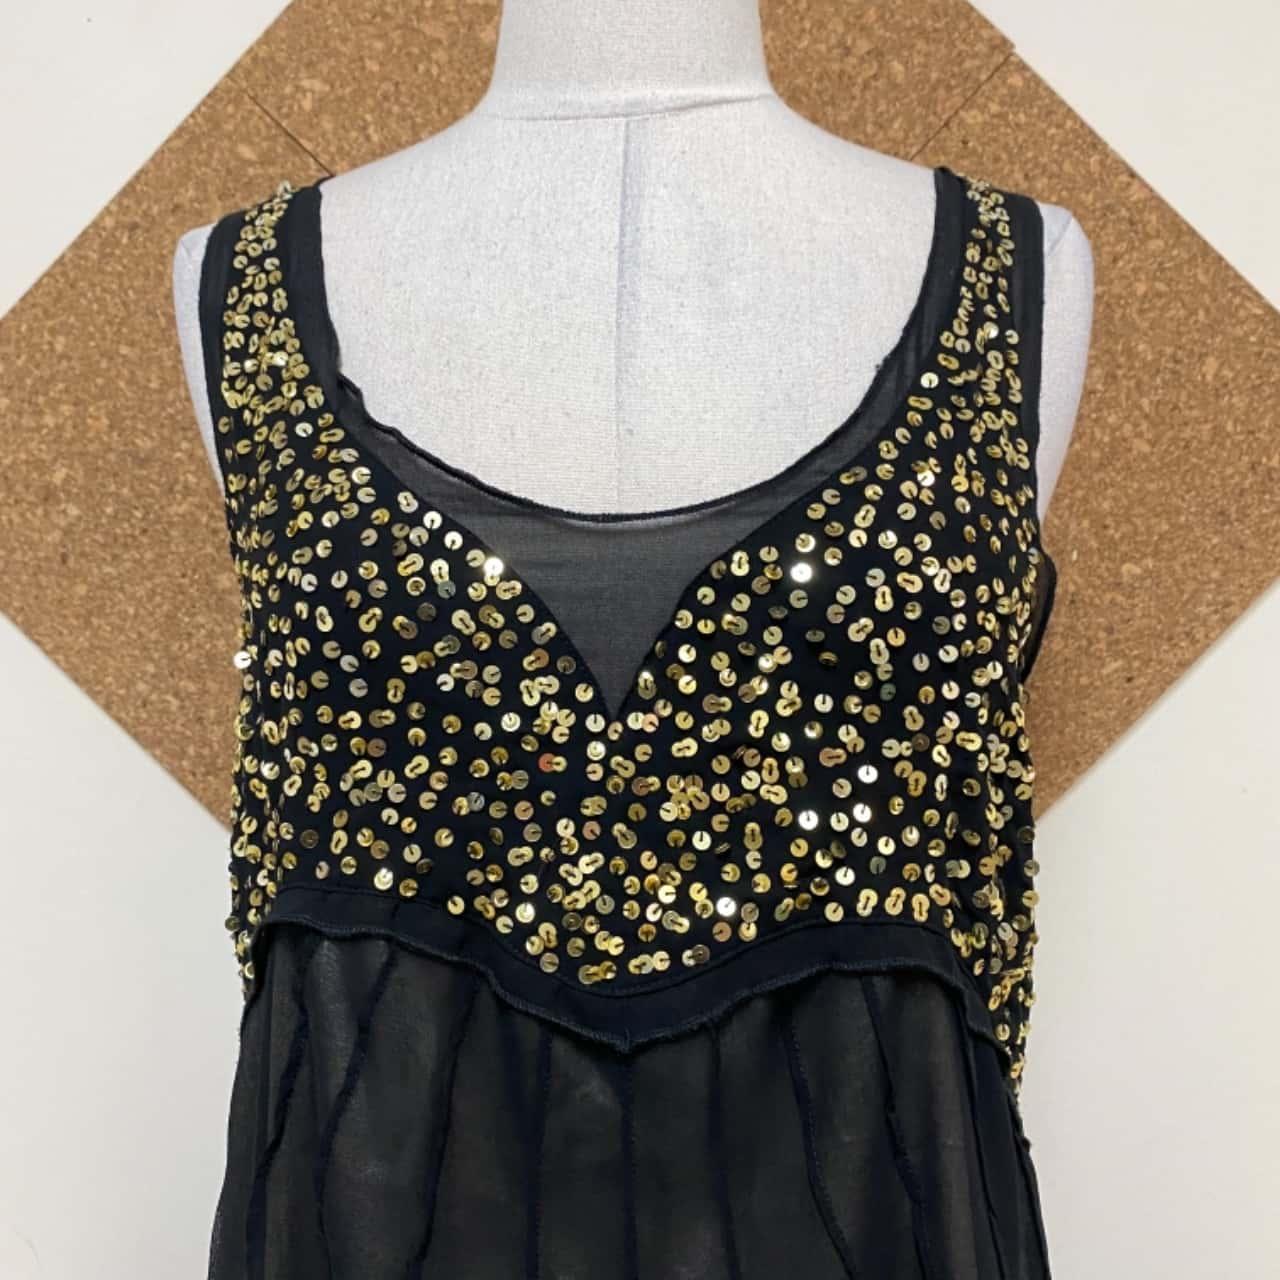 Women's Black /Gold Dress By FLAUNT size 14